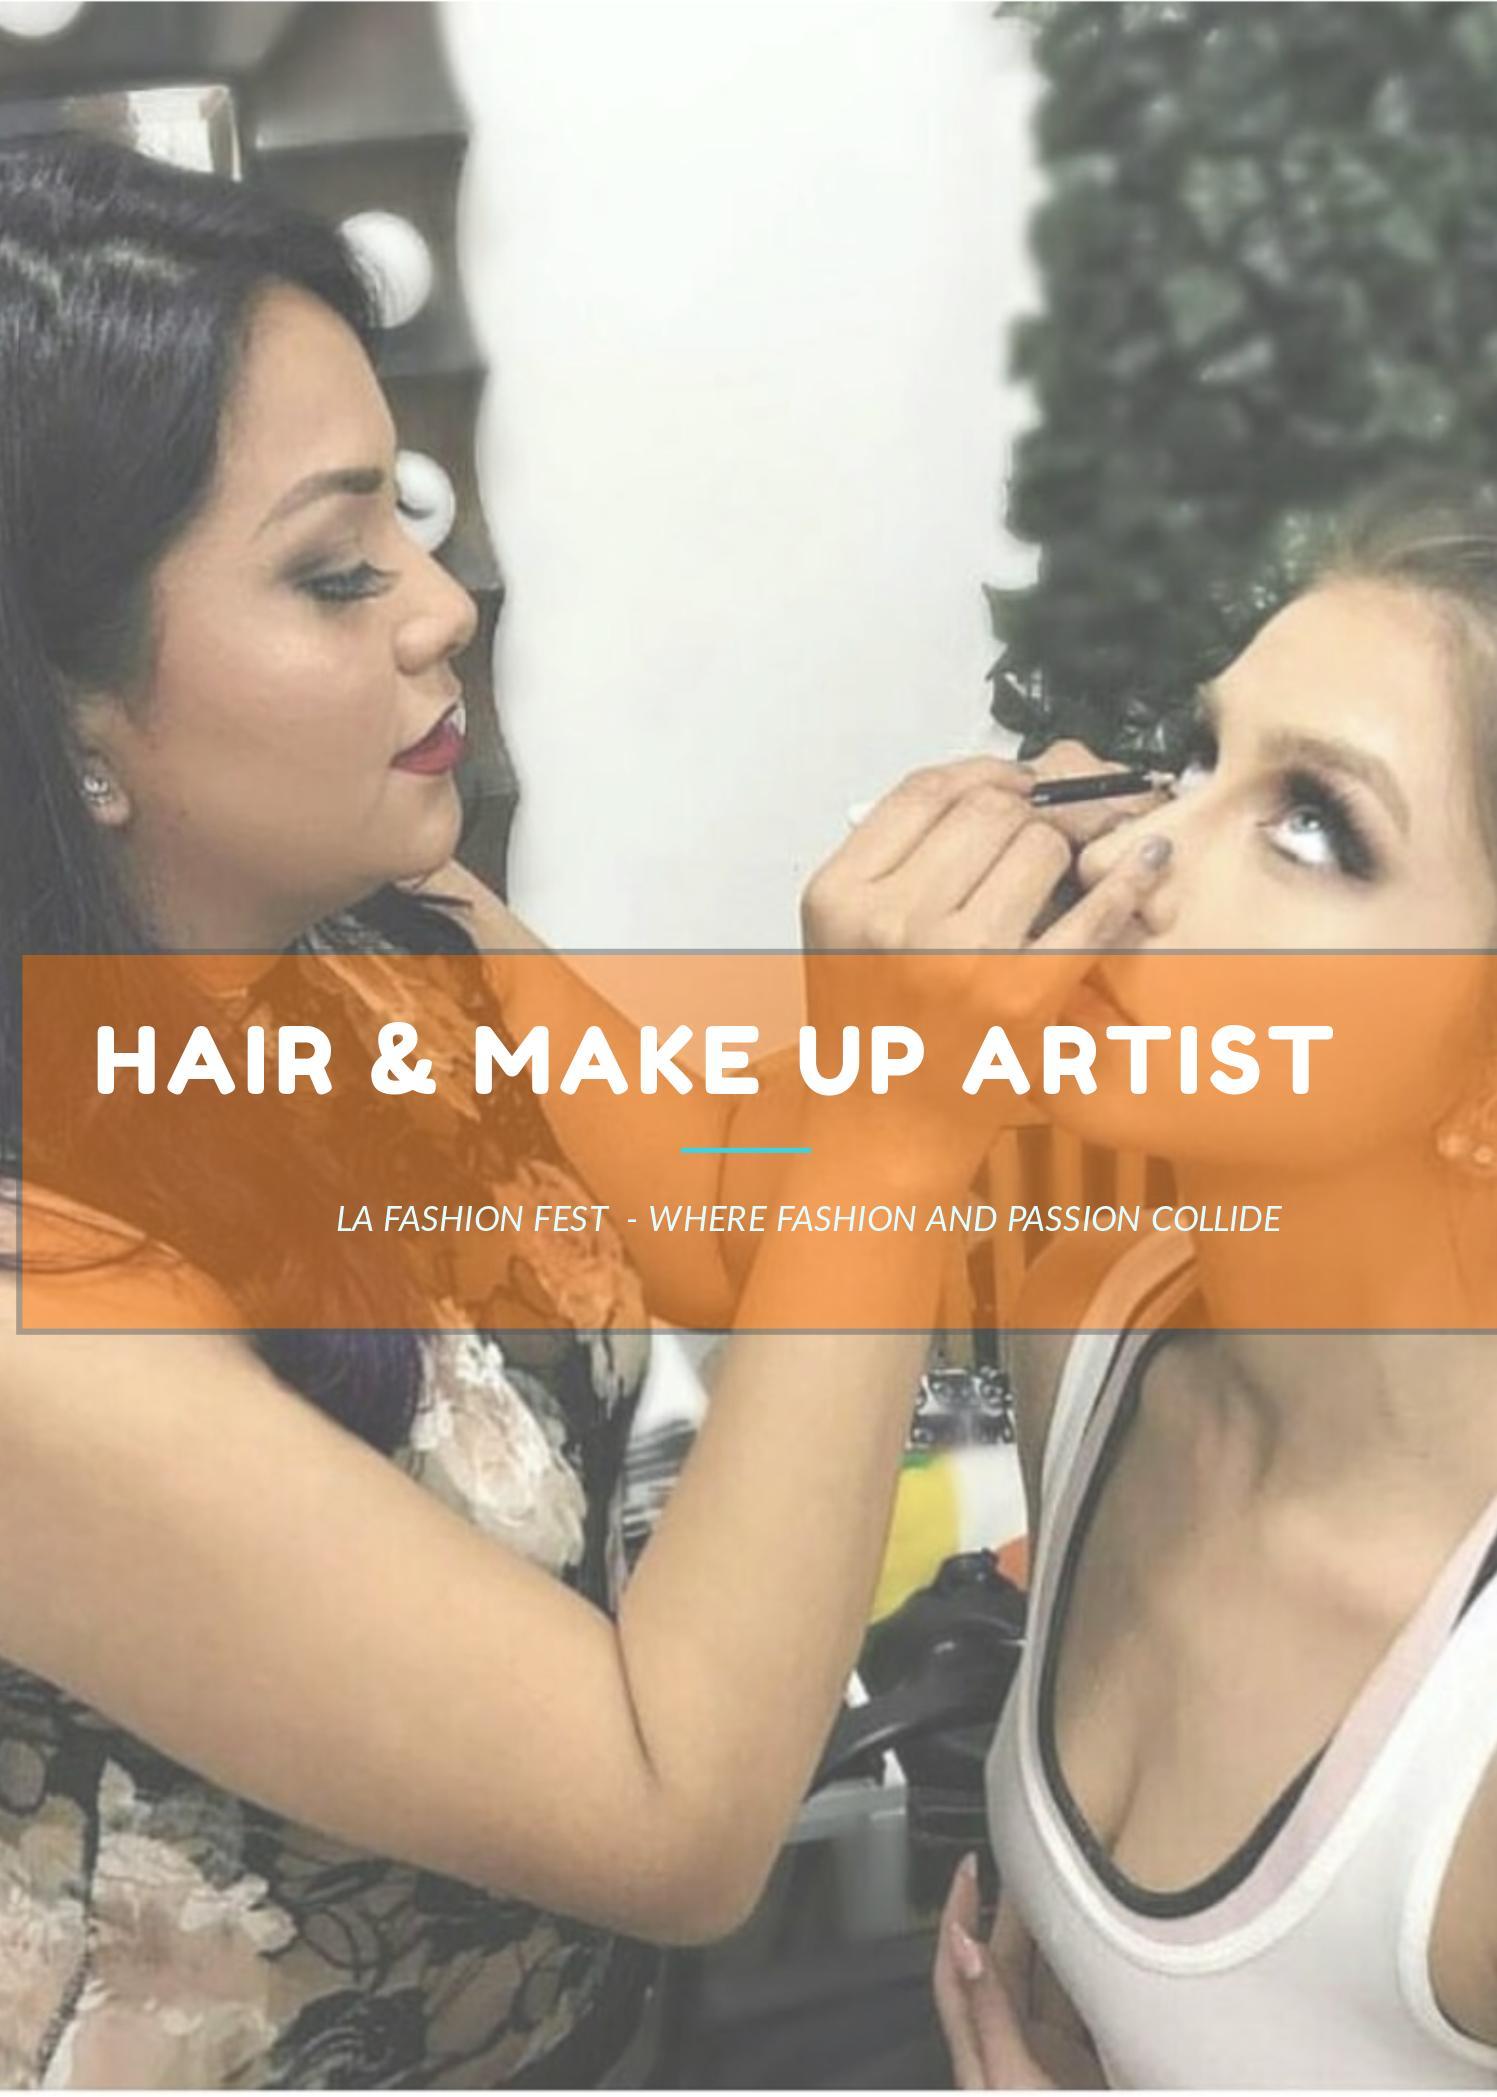 La Fashion Fest hair and make up registrants